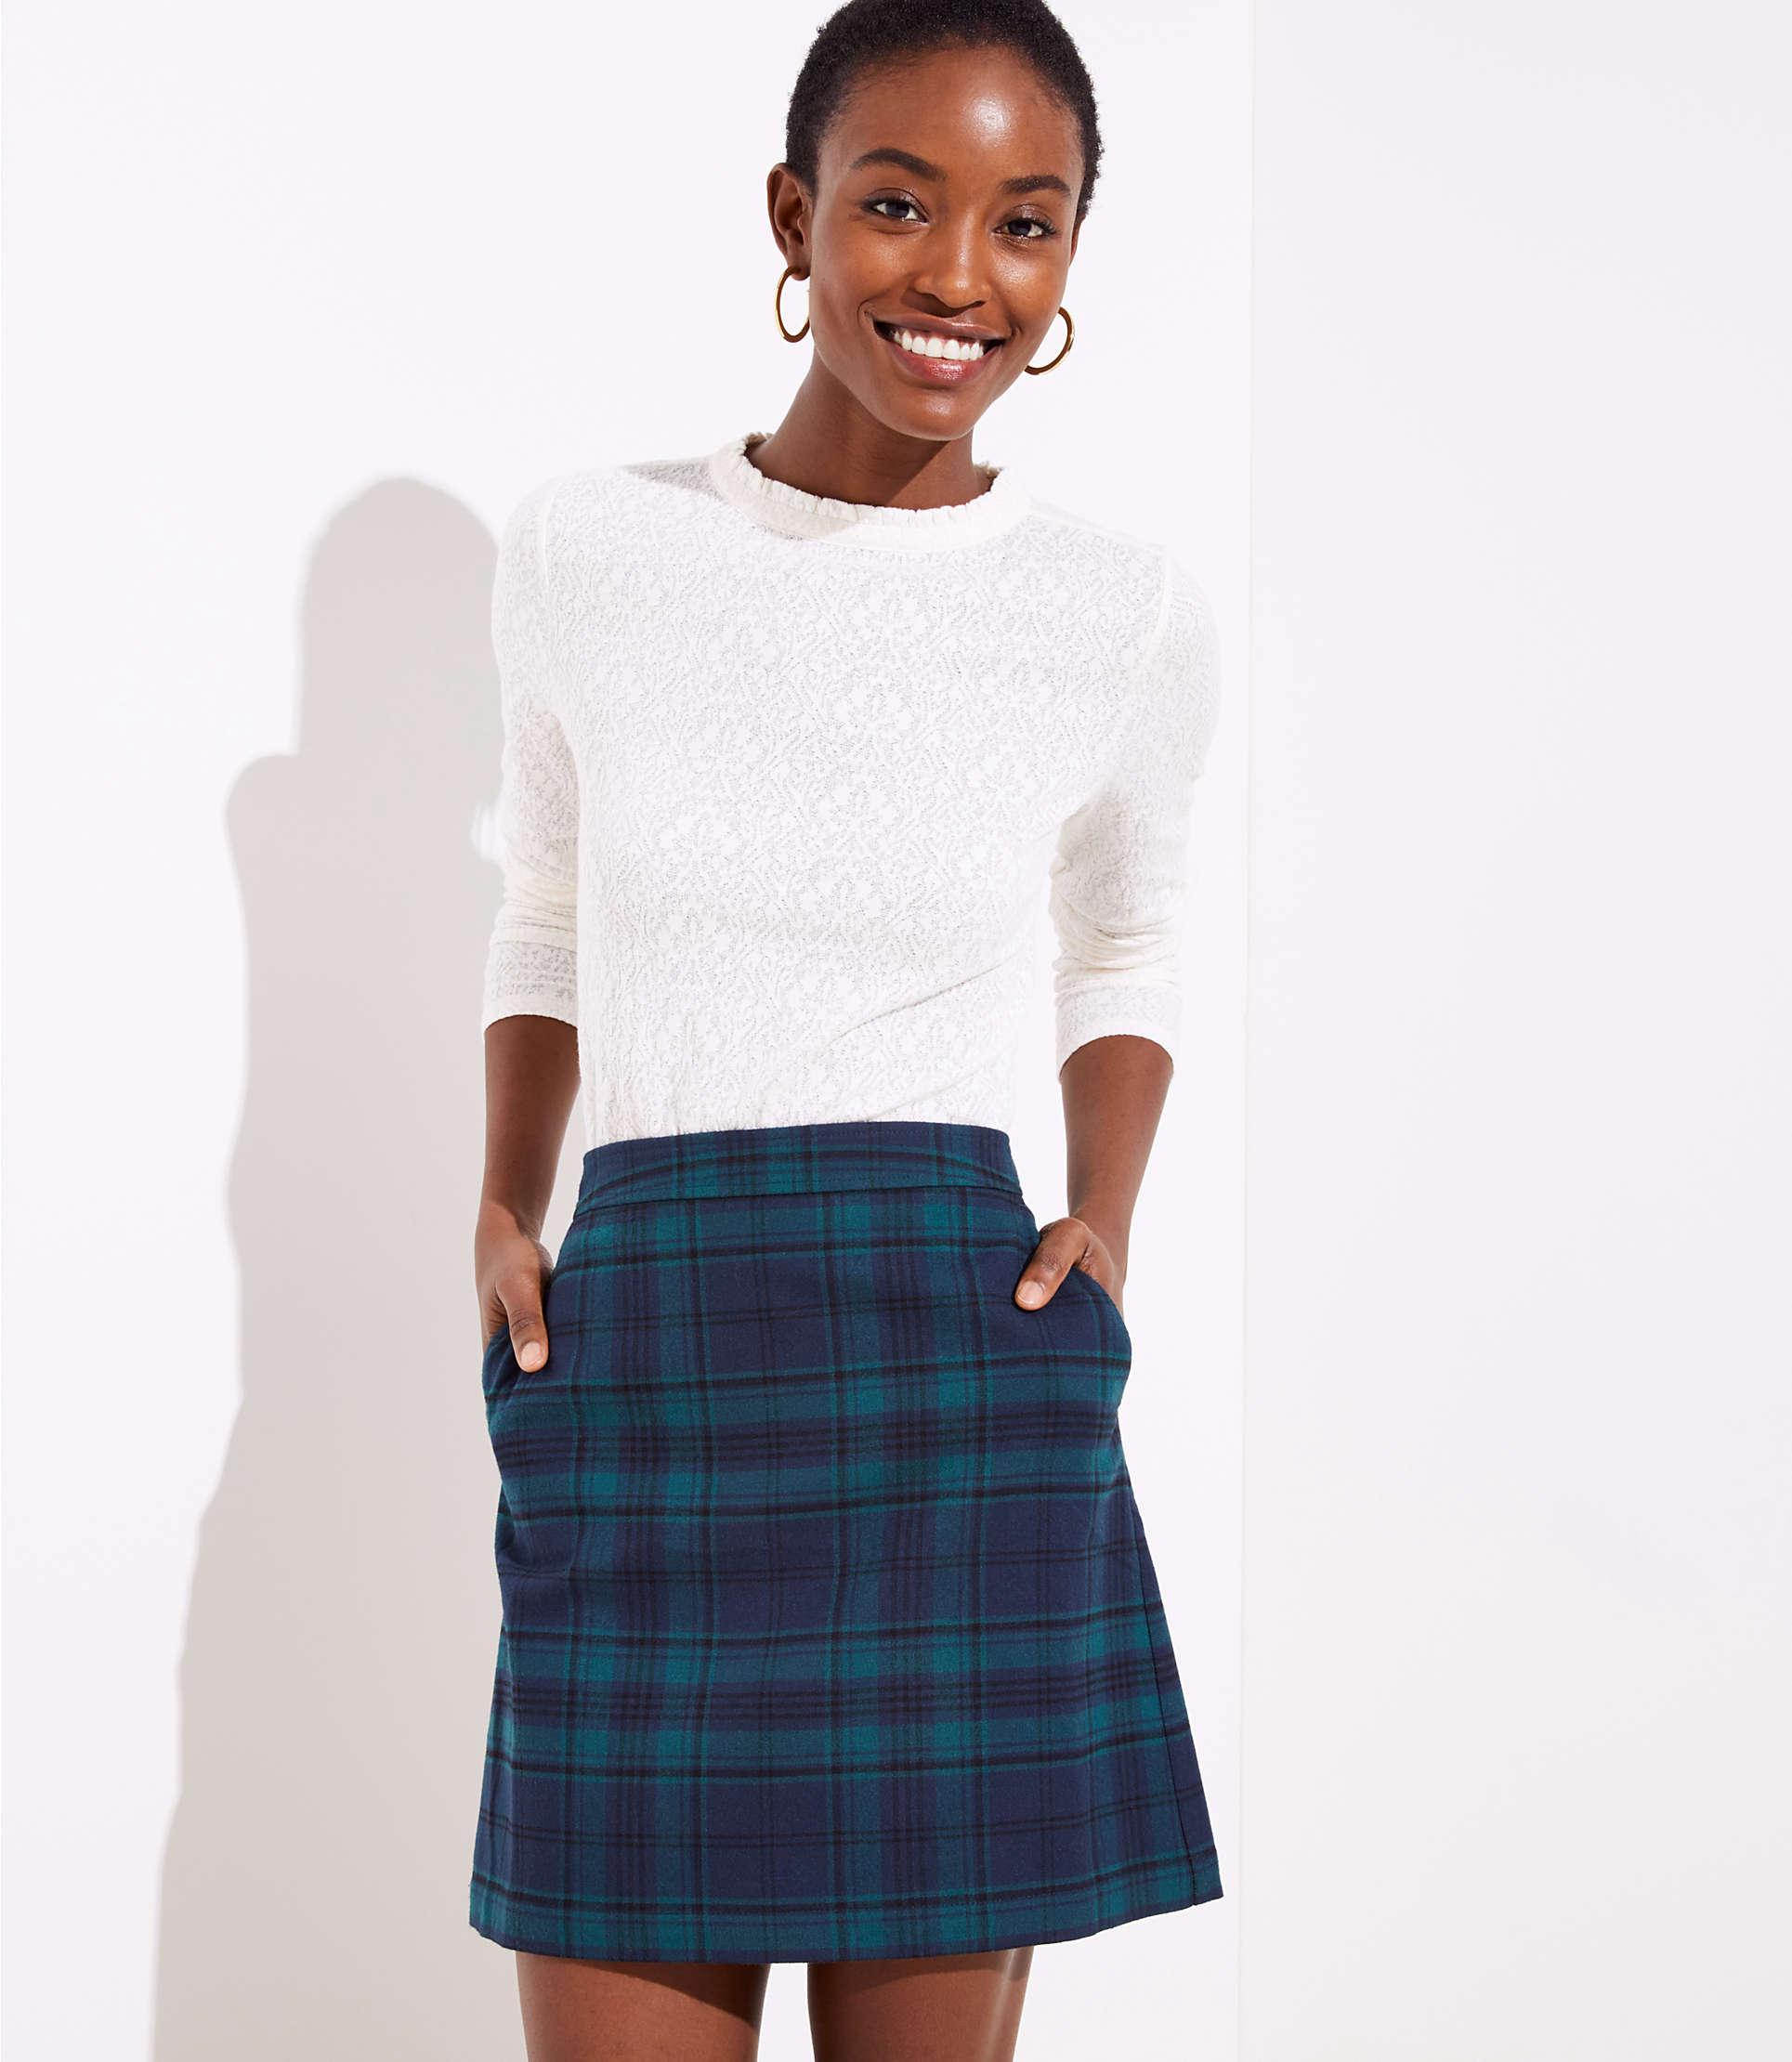 0e7aa8630 Lyst - LOFT Plaid Pocket Shift Skirt in Blue - Save 39.0625%